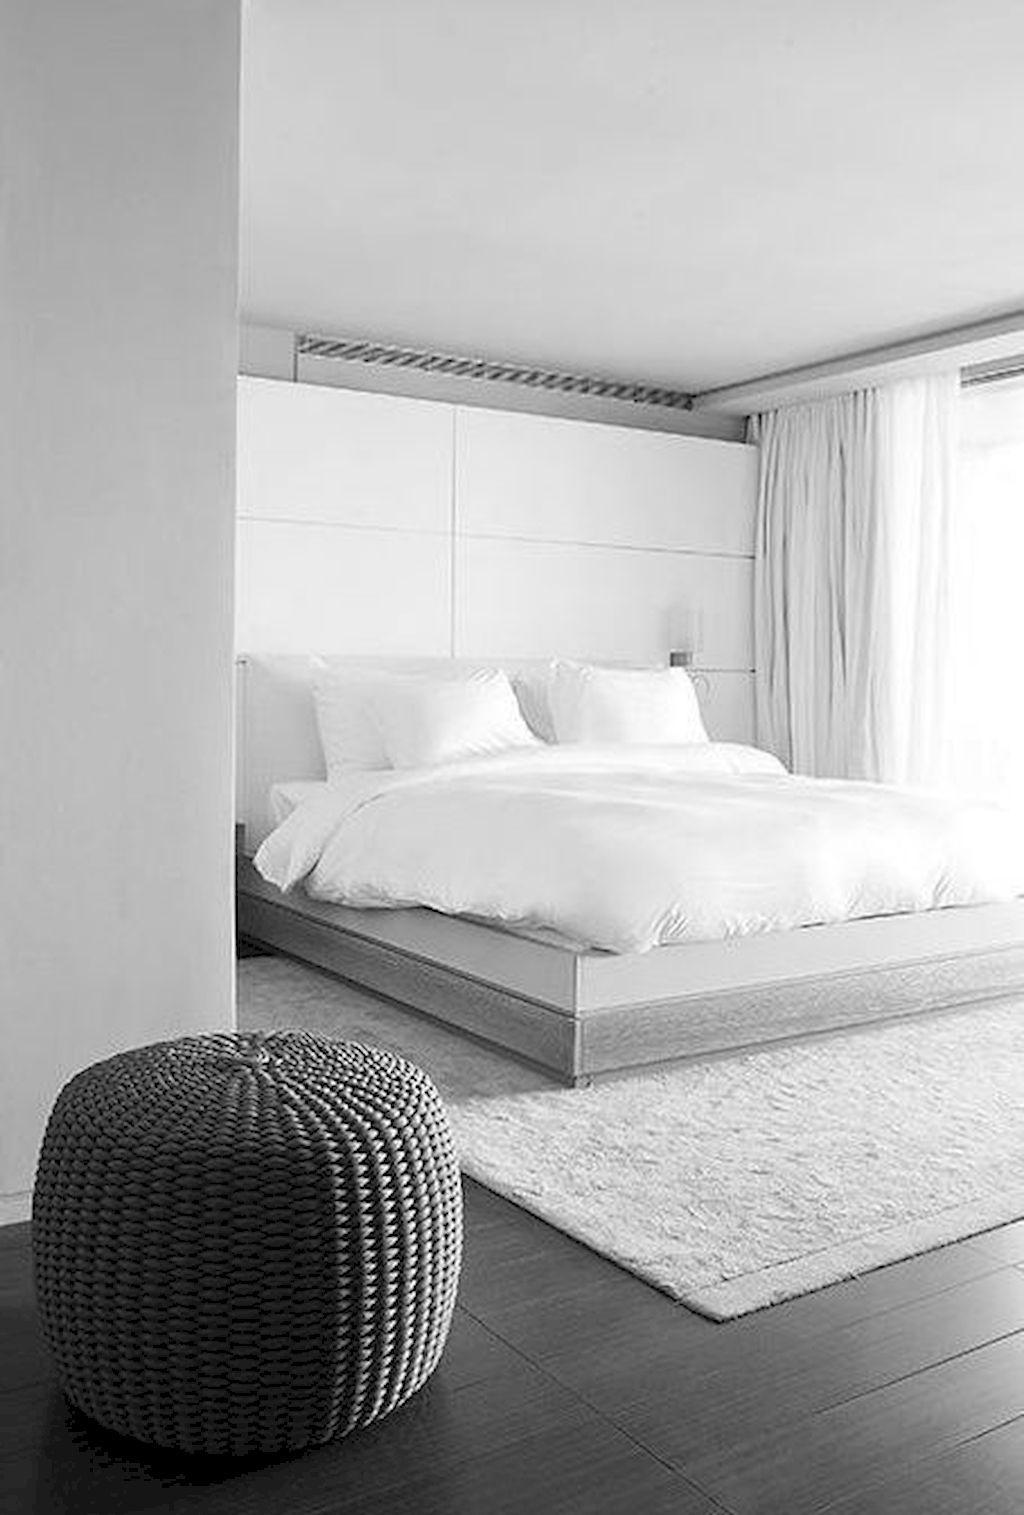 90 cozy minimalist bedroom designs spaciroom com white on cozy minimalist bedroom decorating ideas id=52154